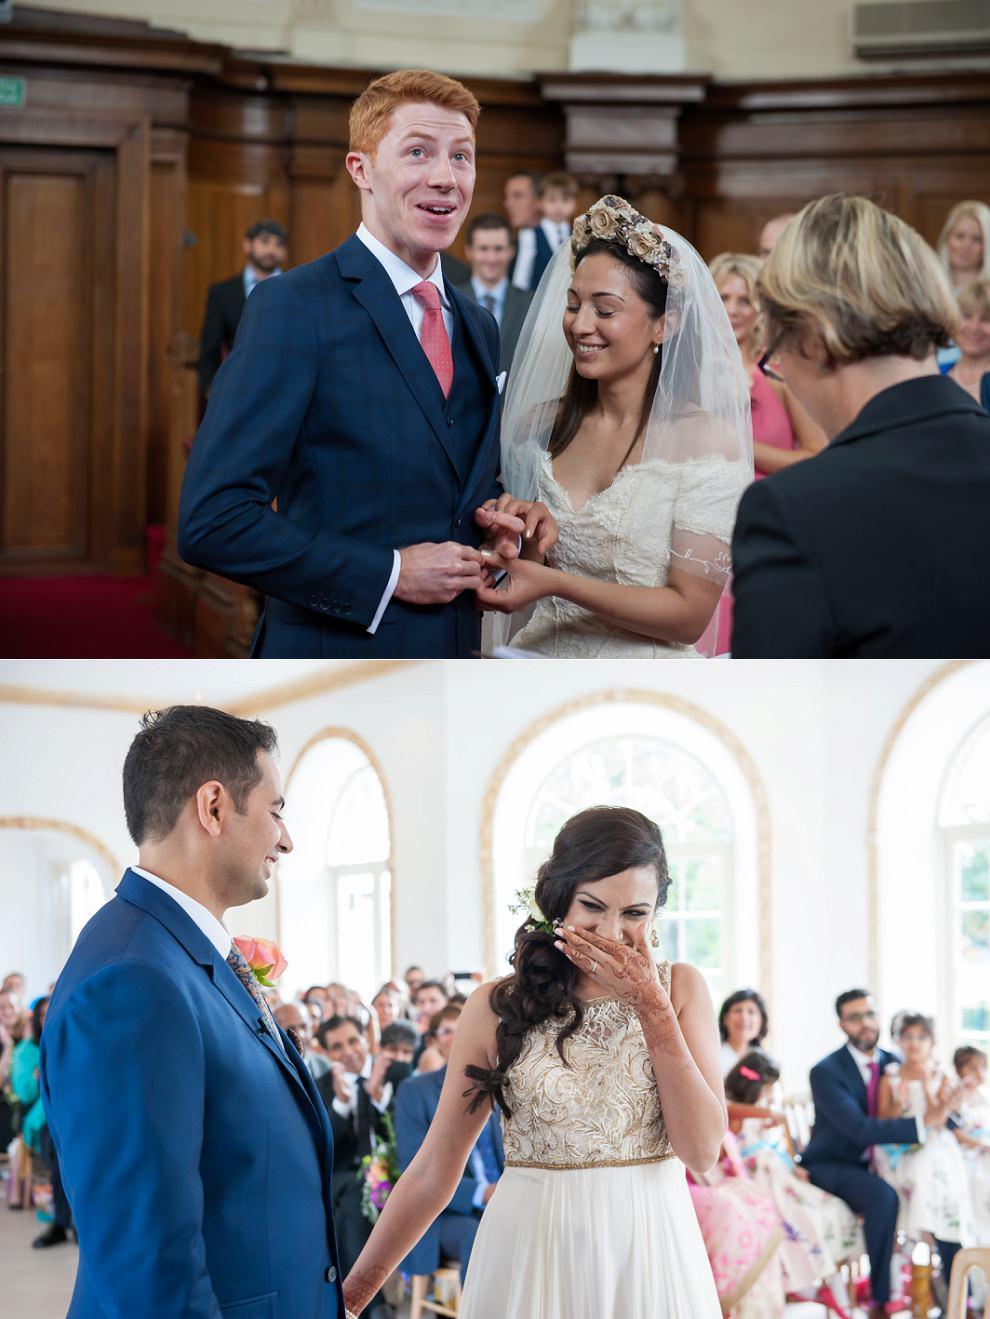 Best-wedding-photos-UK-2015-059